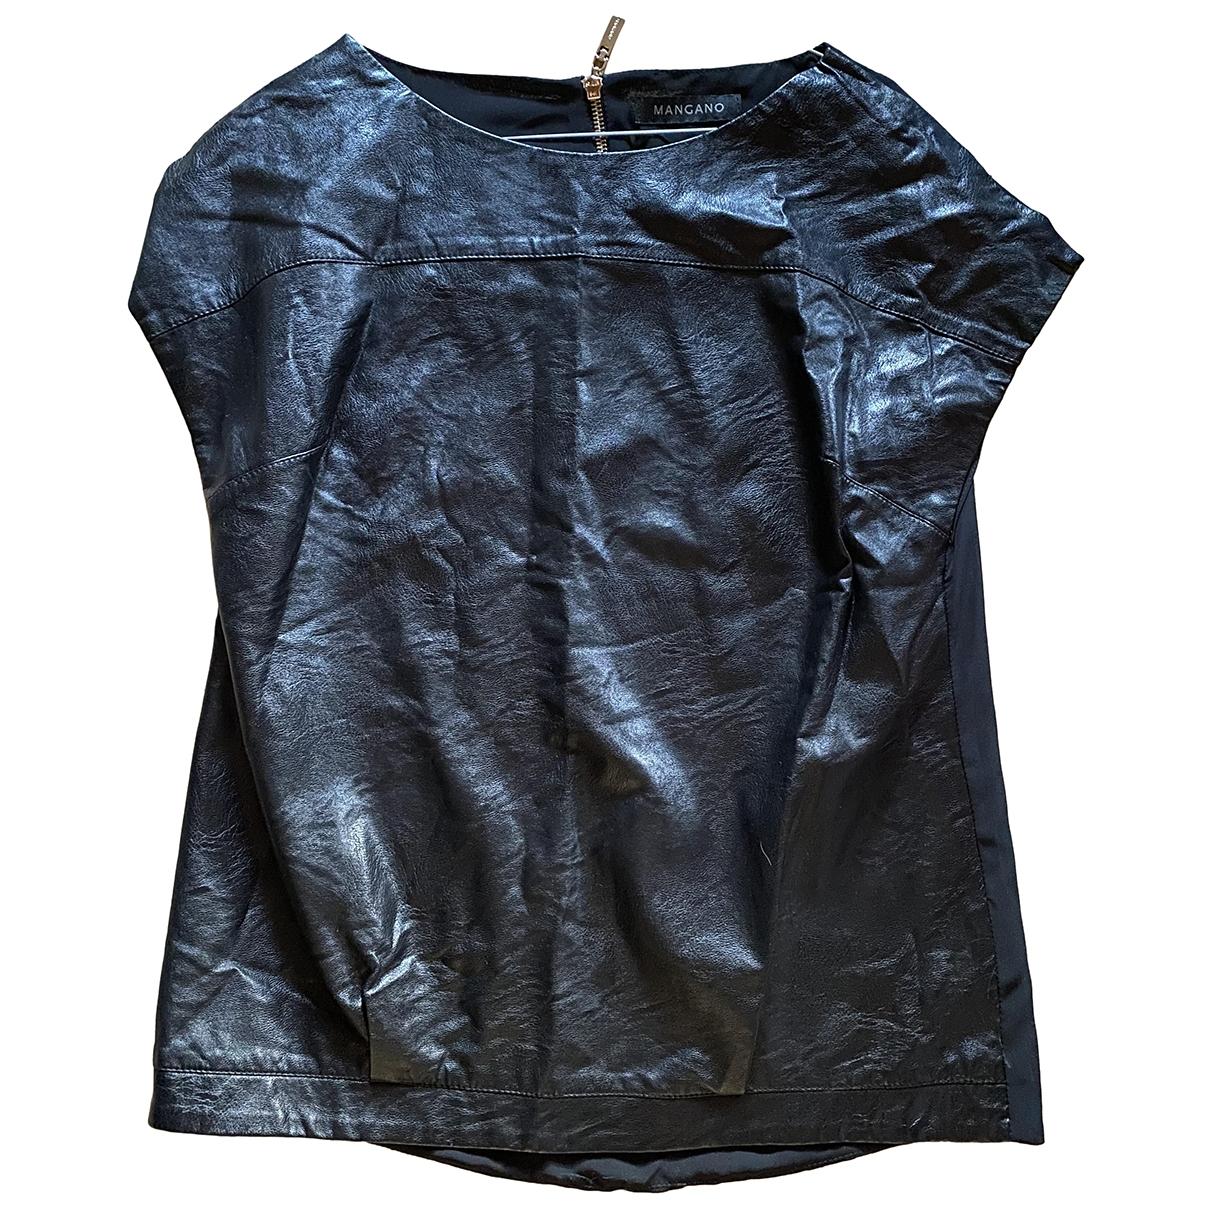 Mangano \N Top in  Schwarz Leder